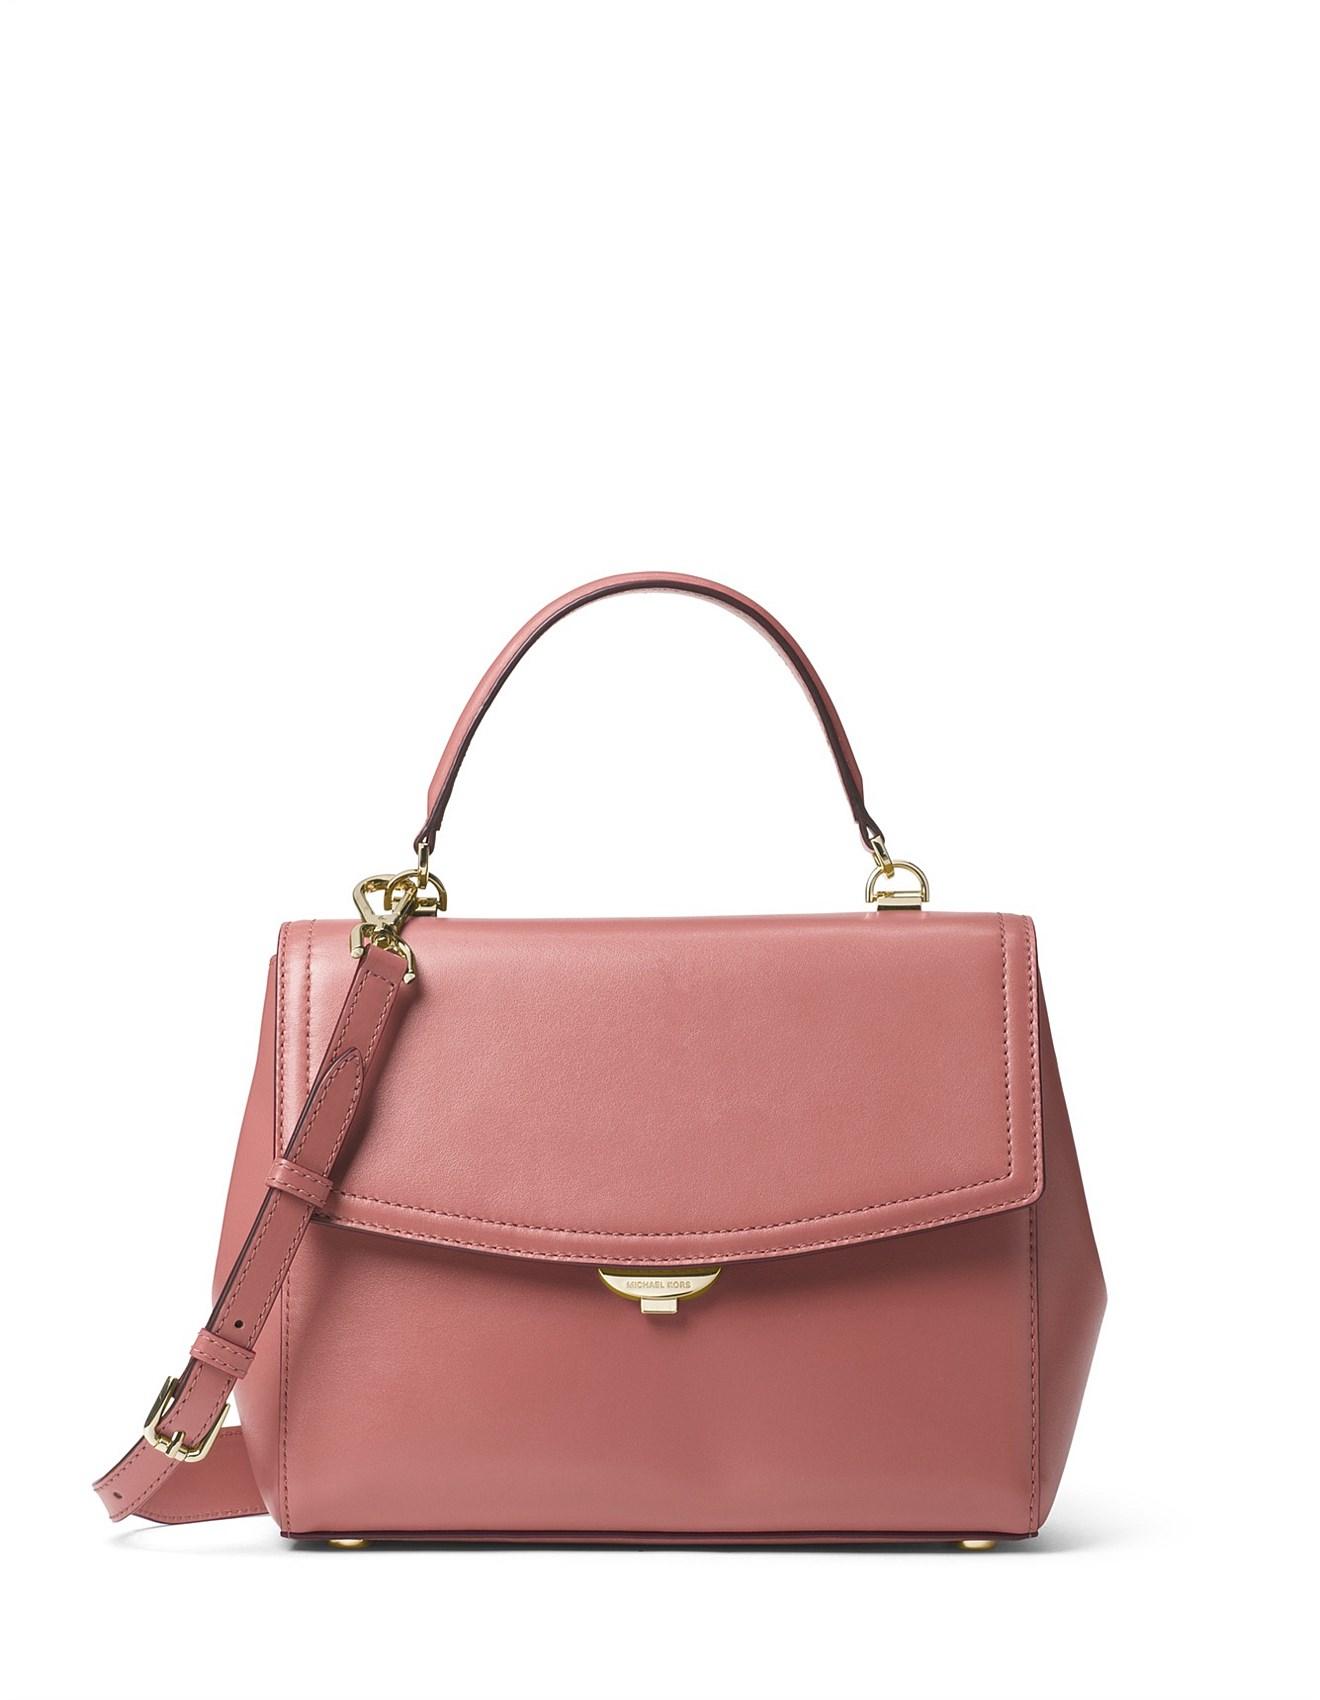 dbbfadd960ba Michael Kors   Handbags, Watches & More Online   David Jones - Ava Medium  Leather Satchel